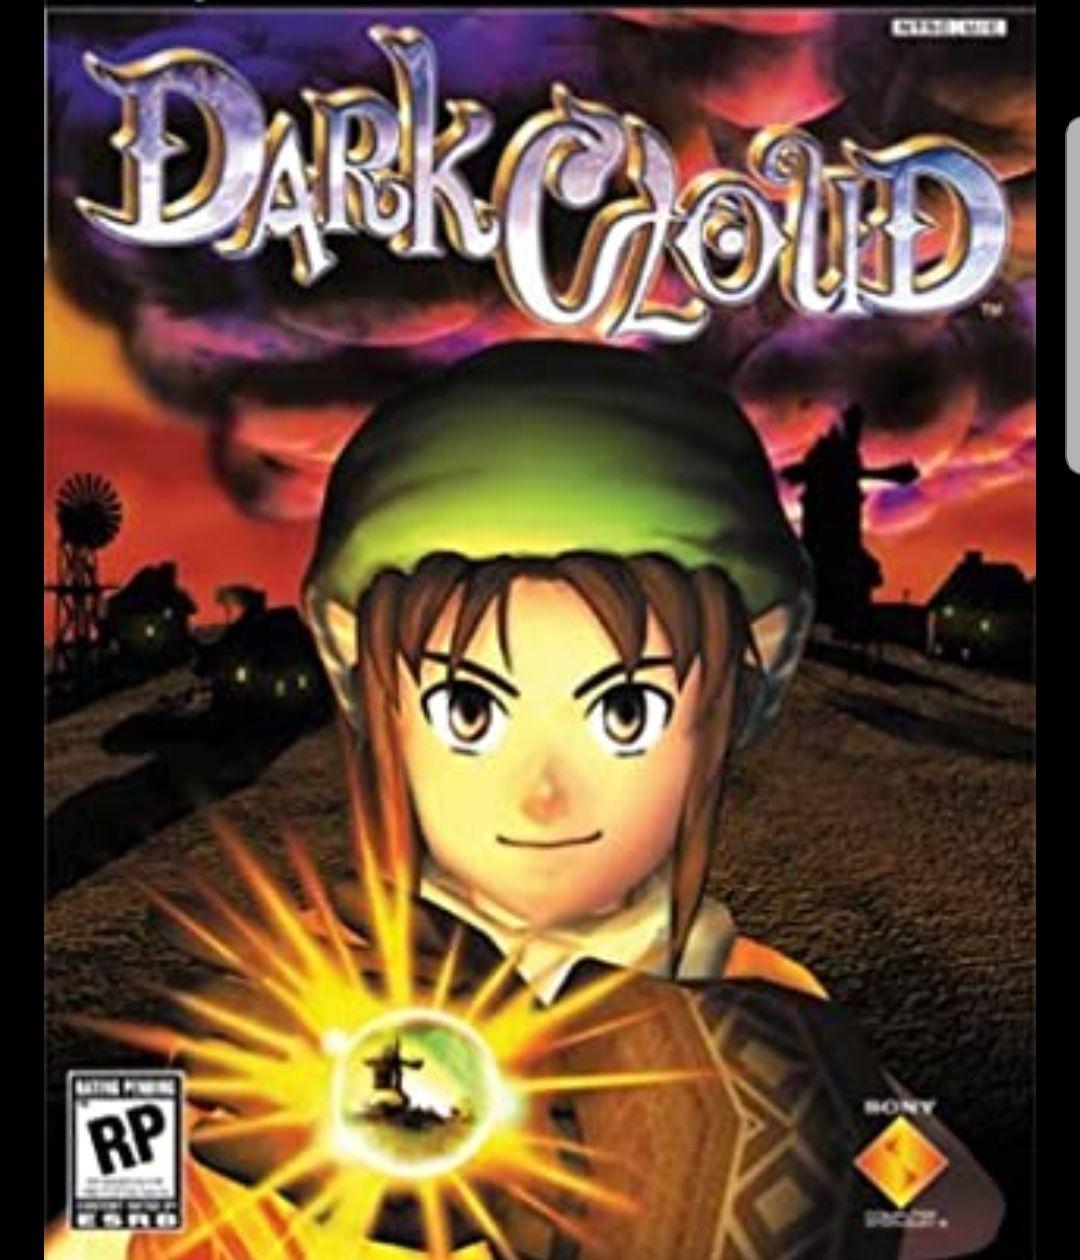 Dark Cloud PS4